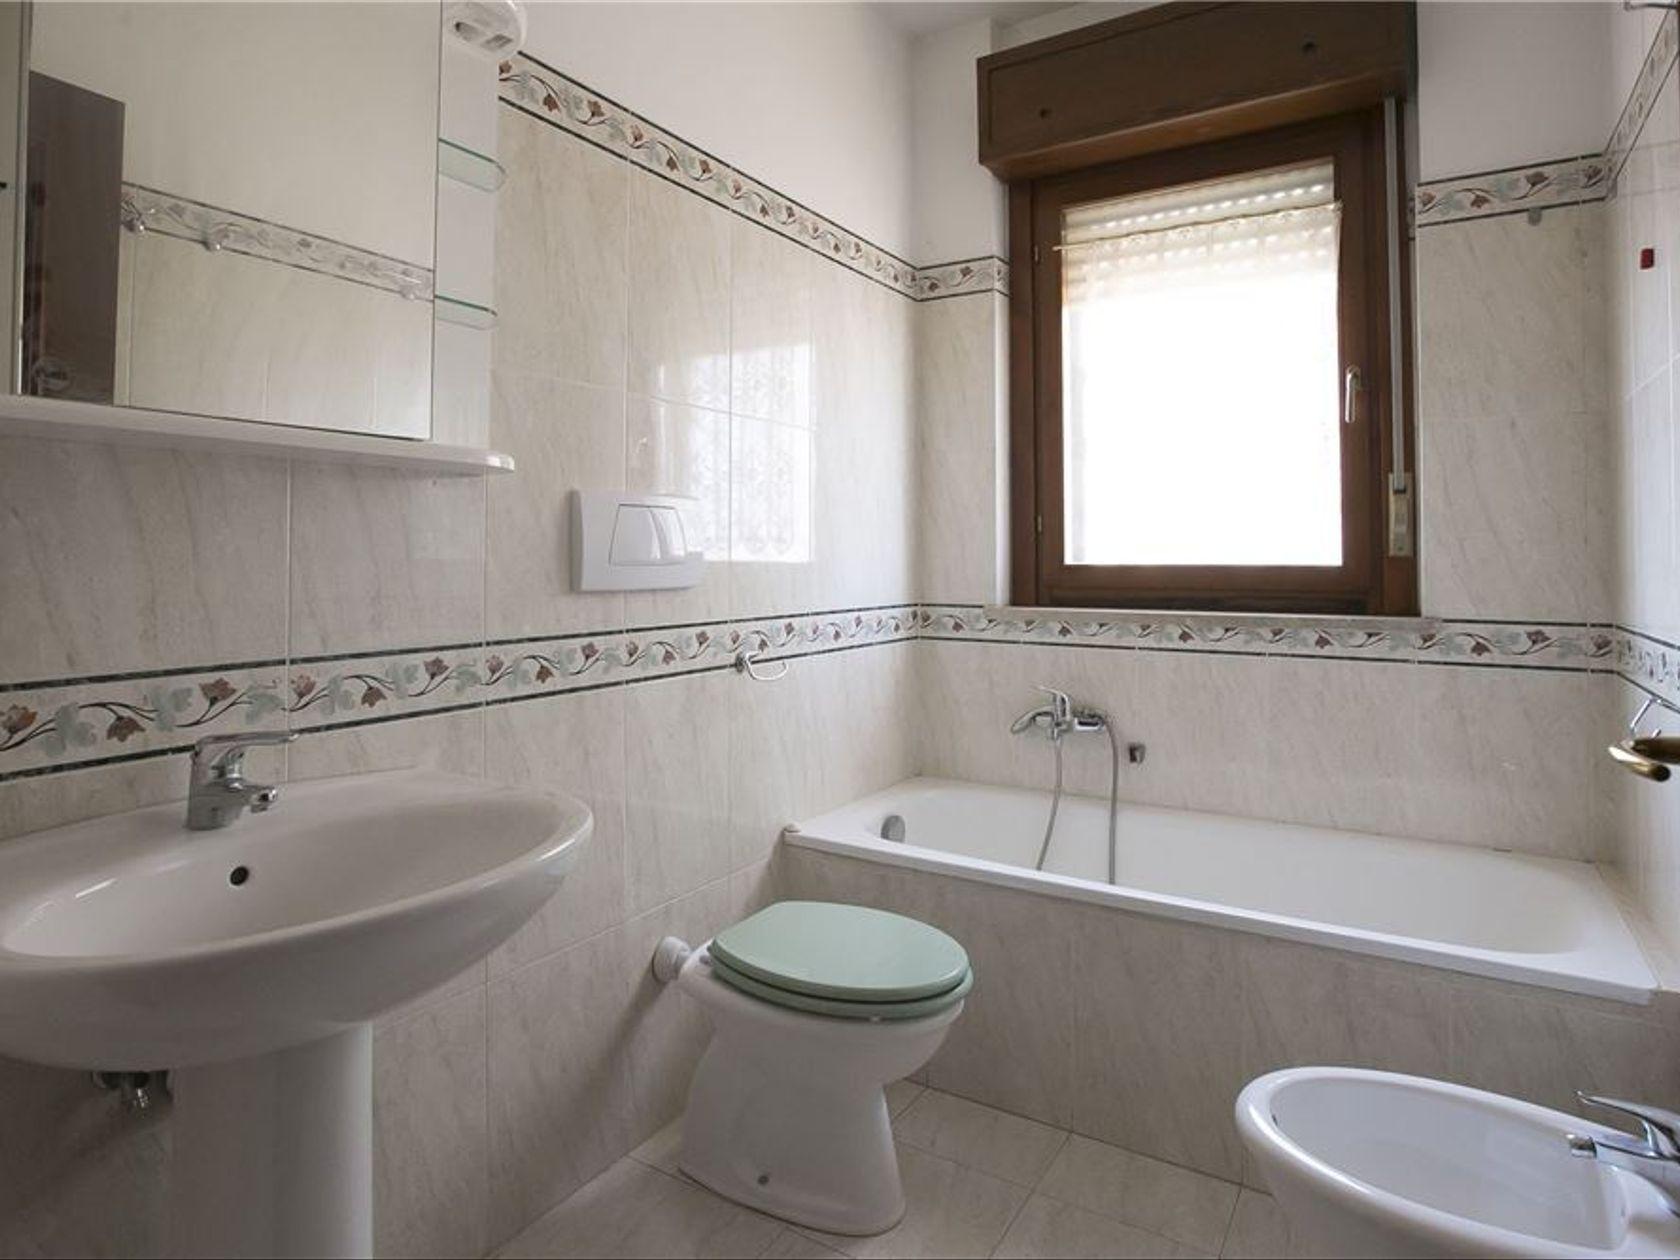 Appartamento Roma-acilia Vitinia Infernetto Axa Casal Palocco, Roma, RM Vendita - Foto 8